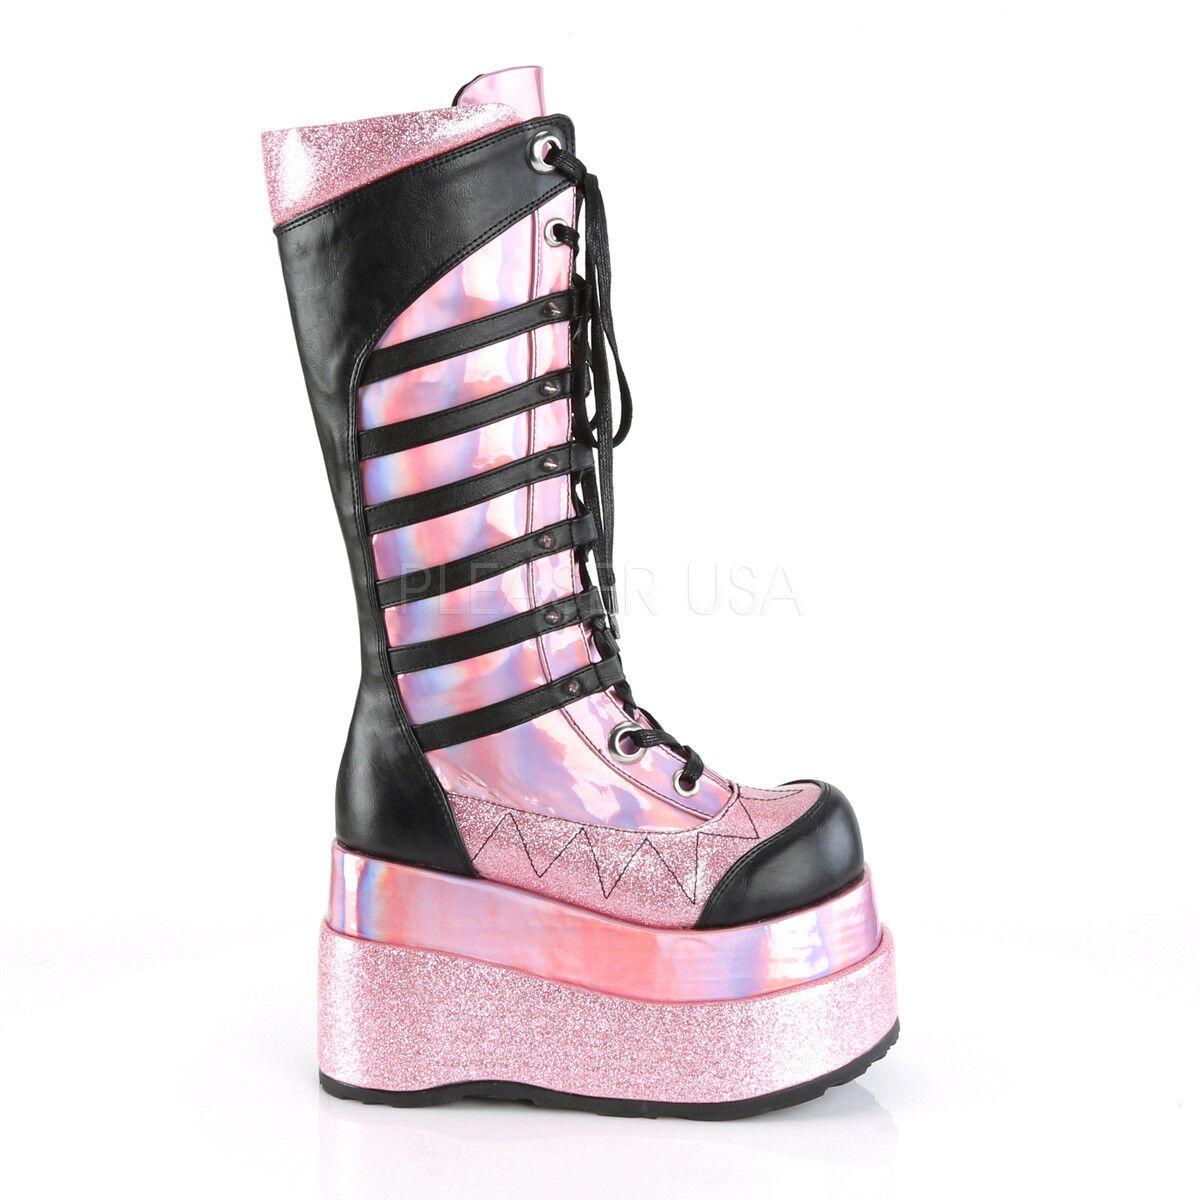 Demonia 4.5  Platform Vegan Pink Blk Hologram Glitter Spike Knee Boots Goth 6-12